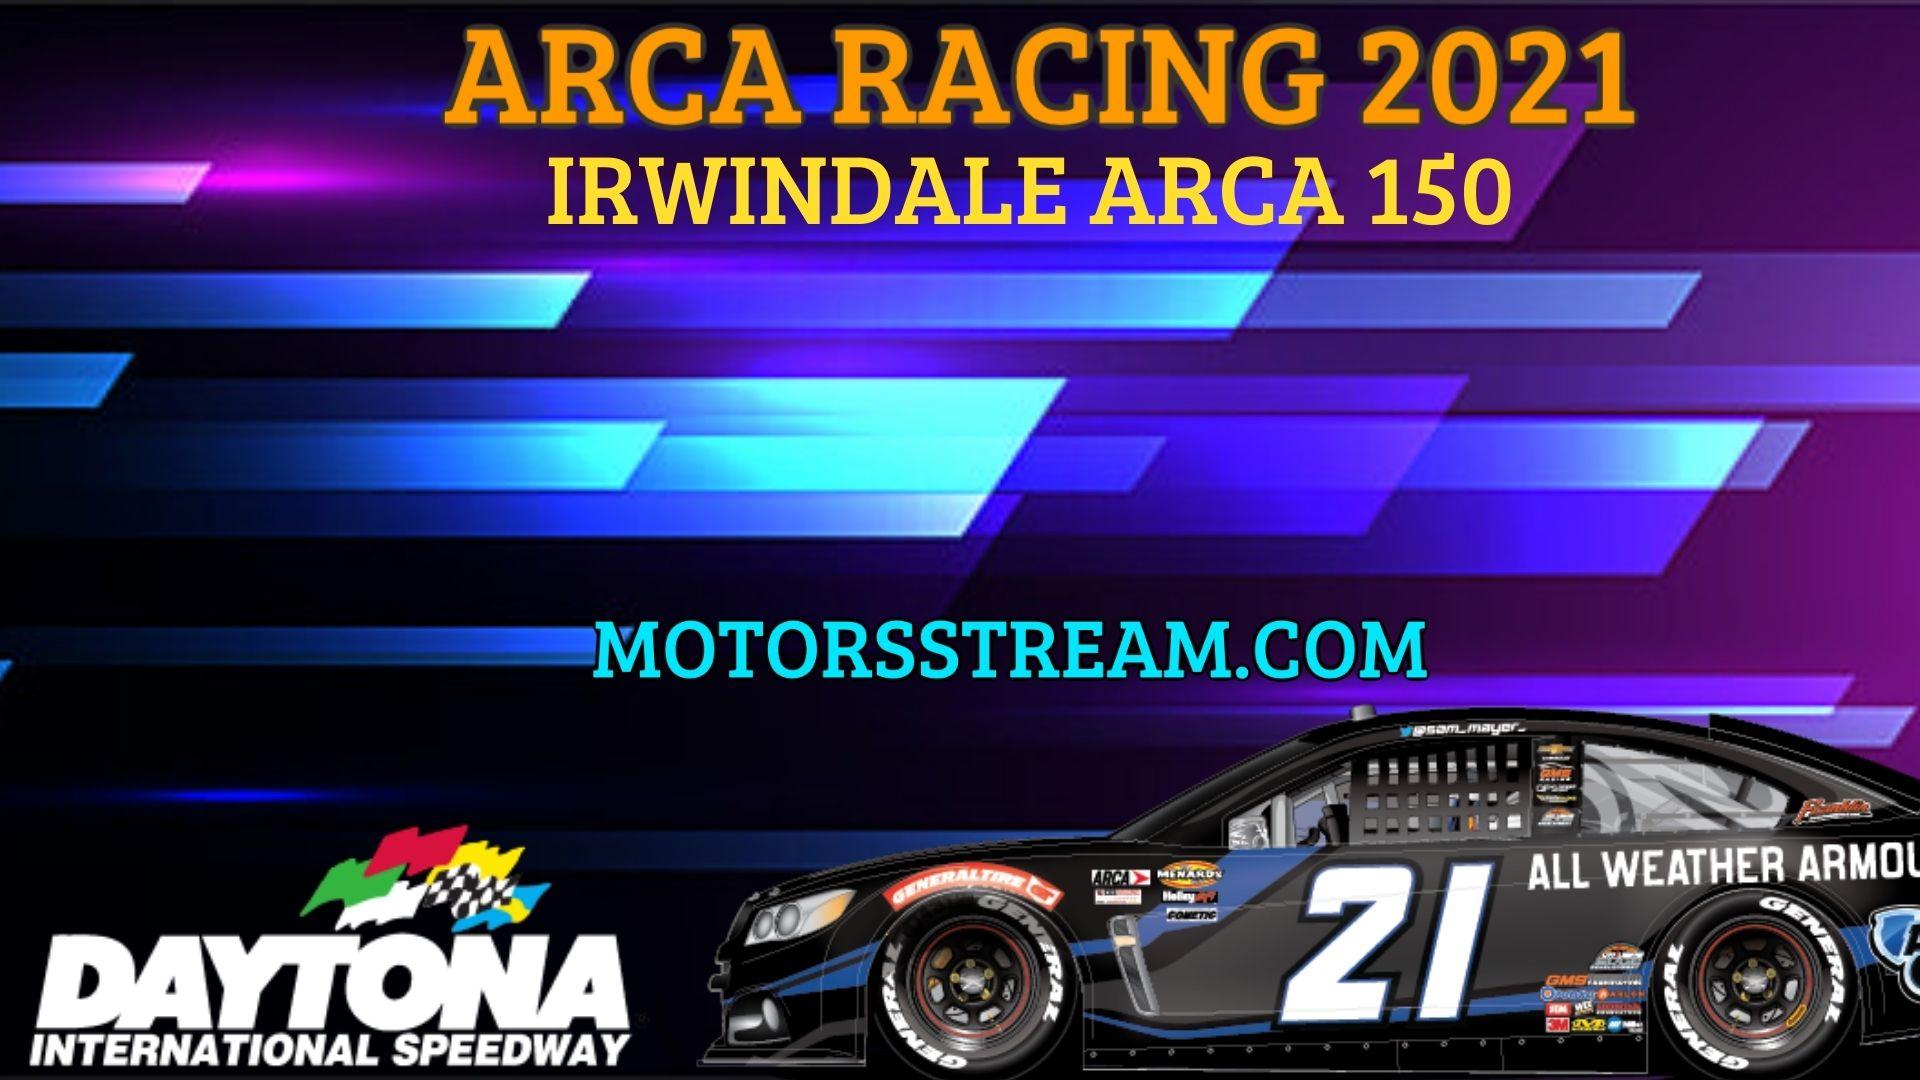 Irwindale ARCA 150 Live Stream 2021 Arca Racing